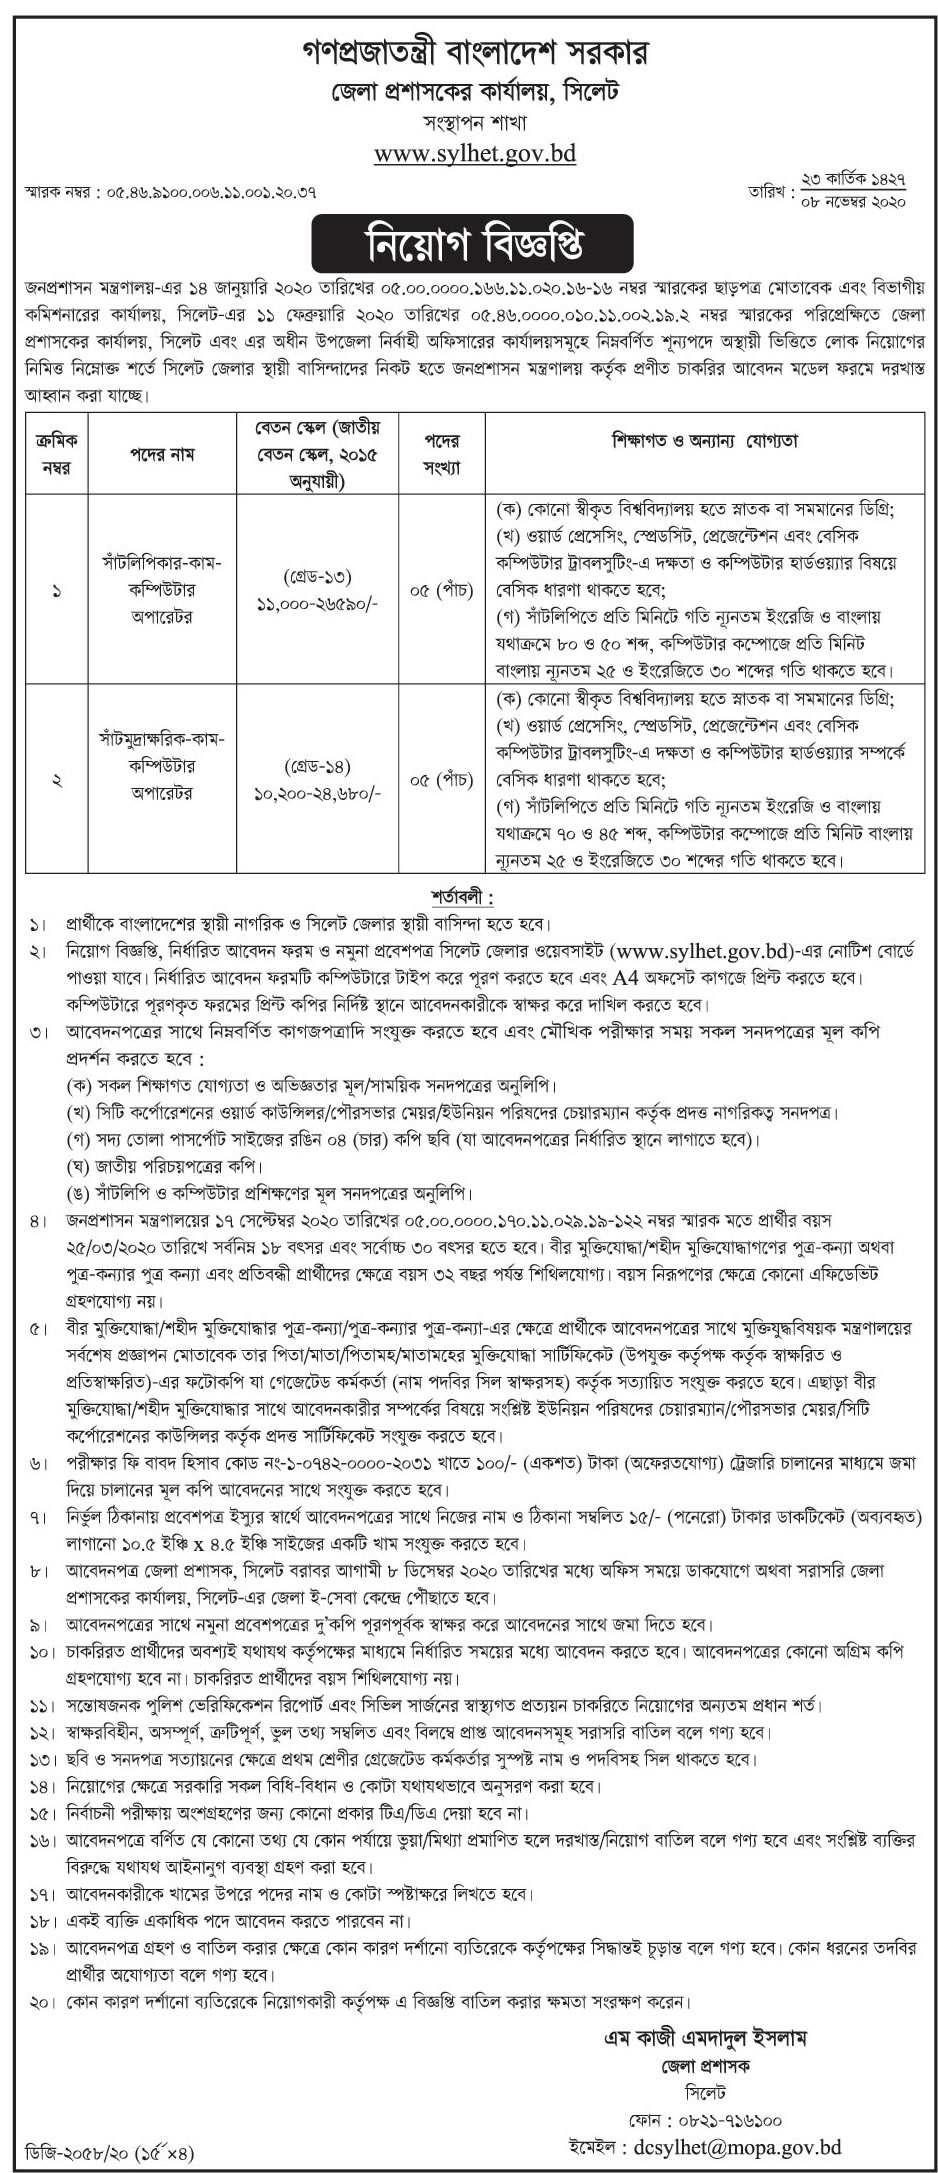 Sylhet DC Office job Circular 2020